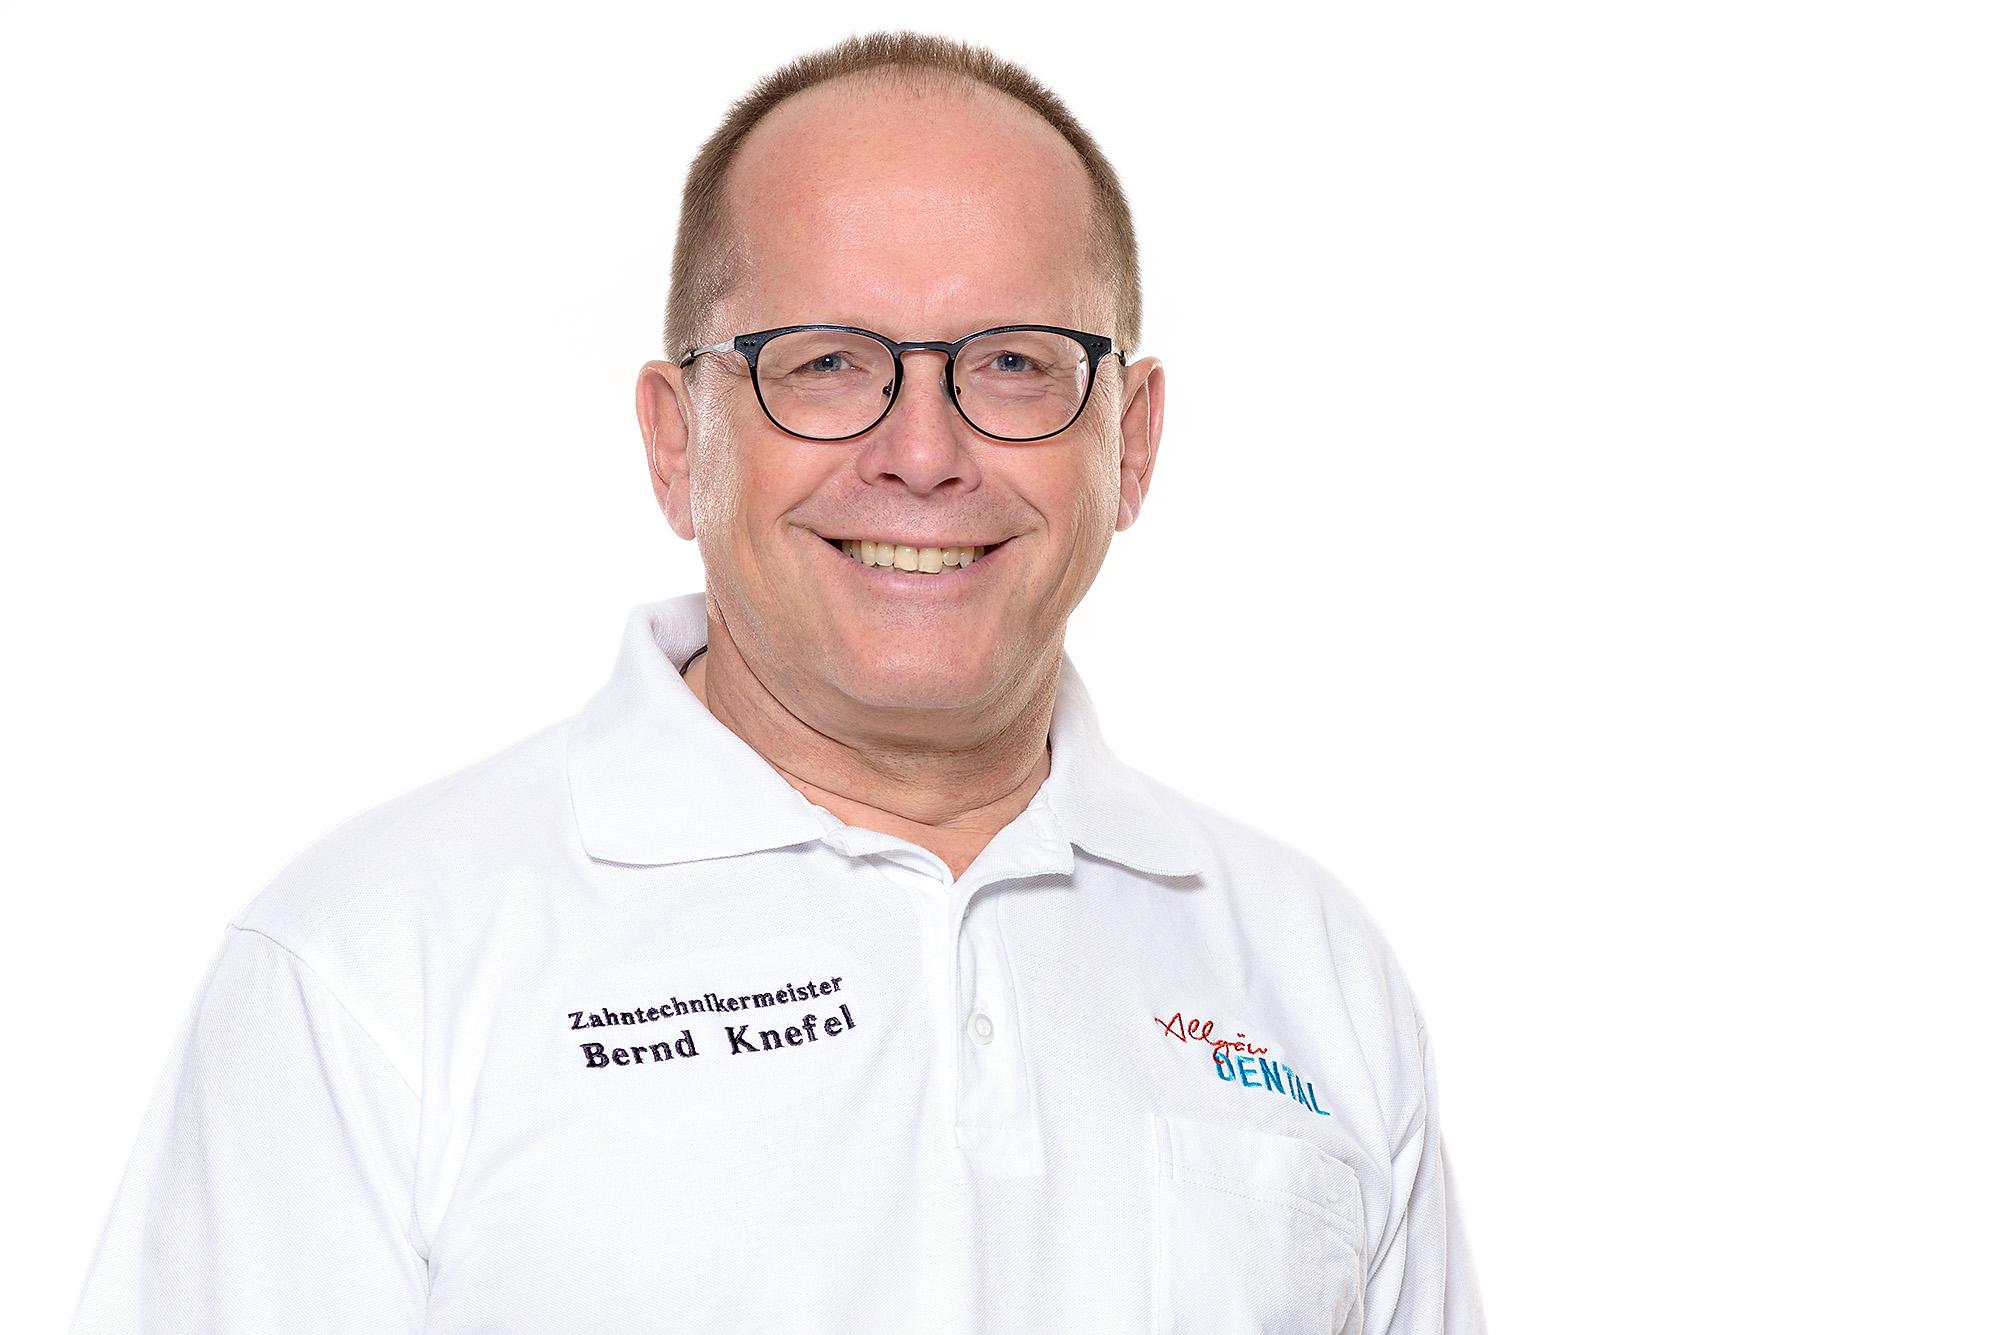 Bernd Knefel